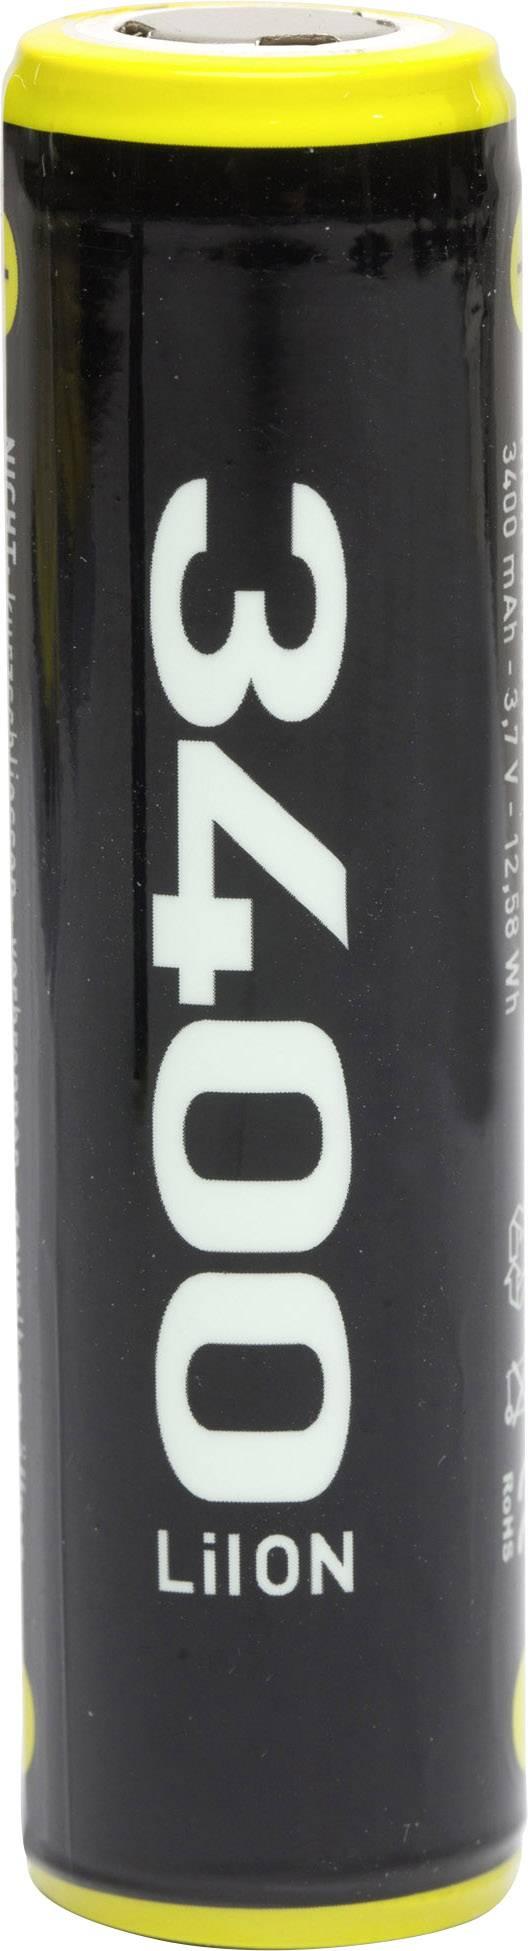 Speciální akumulátor ECELL ECE18650, 18650, Li-Ion akumulátor, 3.7 V, 3400 mAh